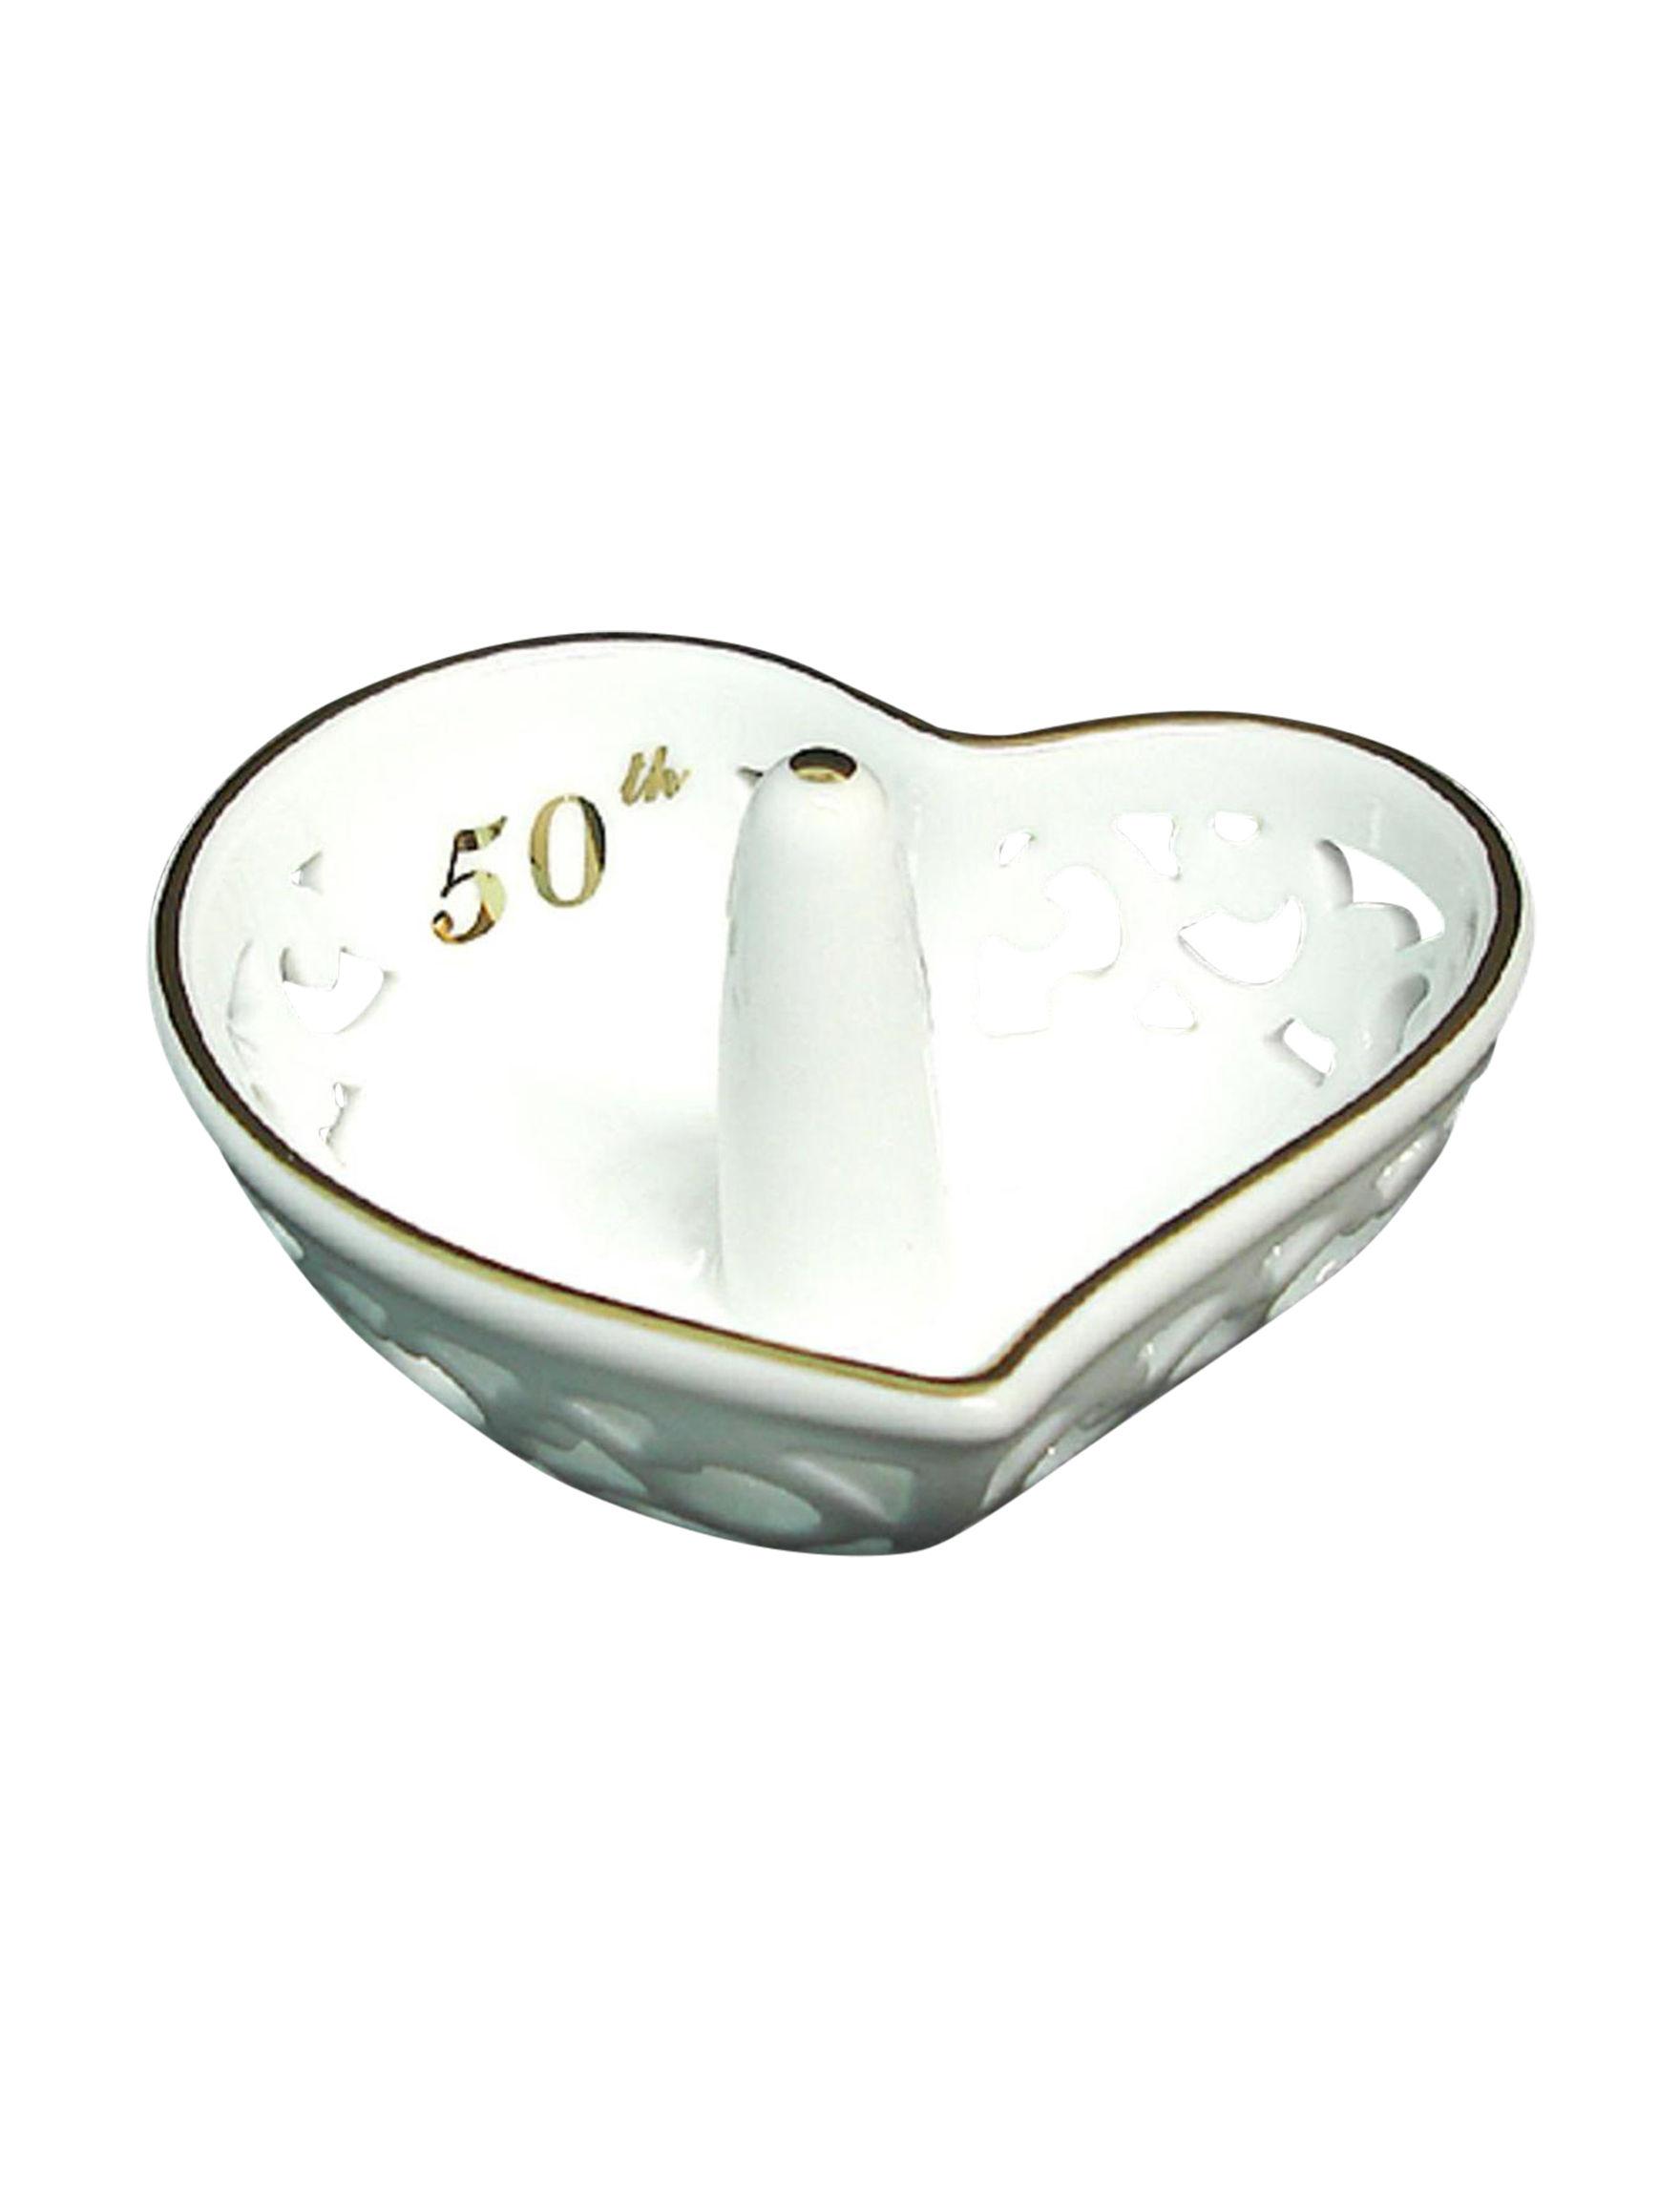 Roman White / Gold Jewelry Storage & Organization